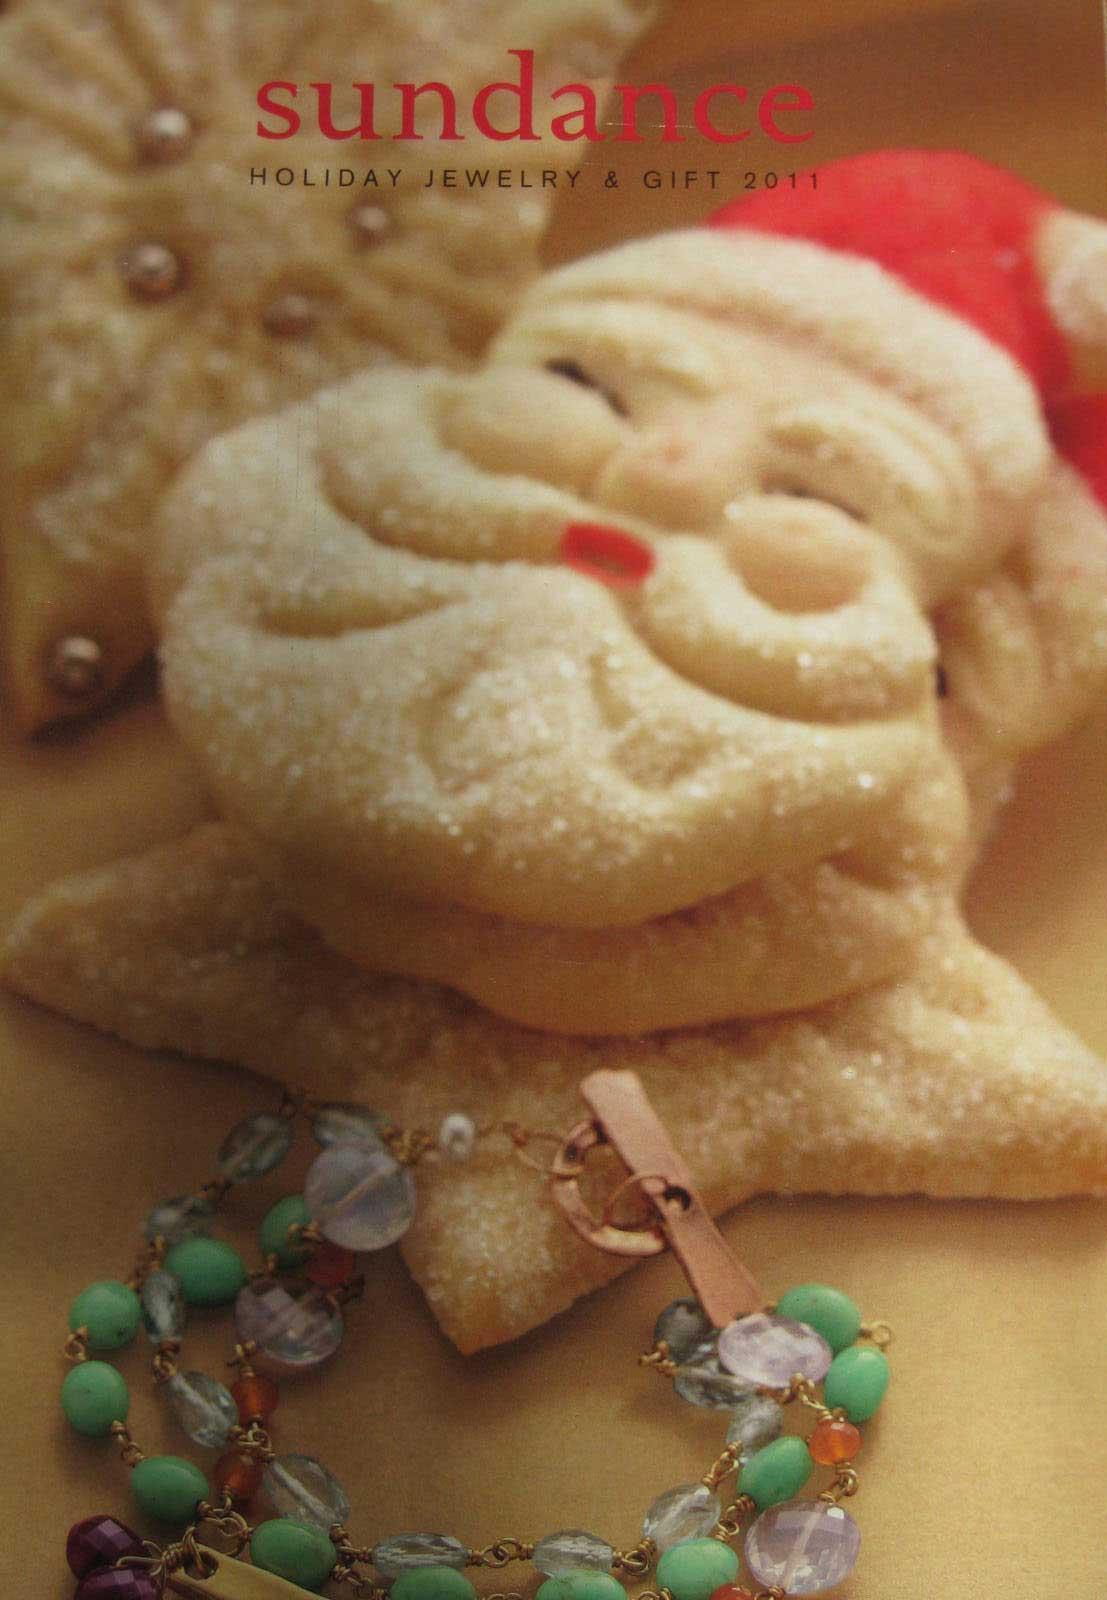 Sundance Catalog Aunt Chick's Jolly Santa Cookie Cover